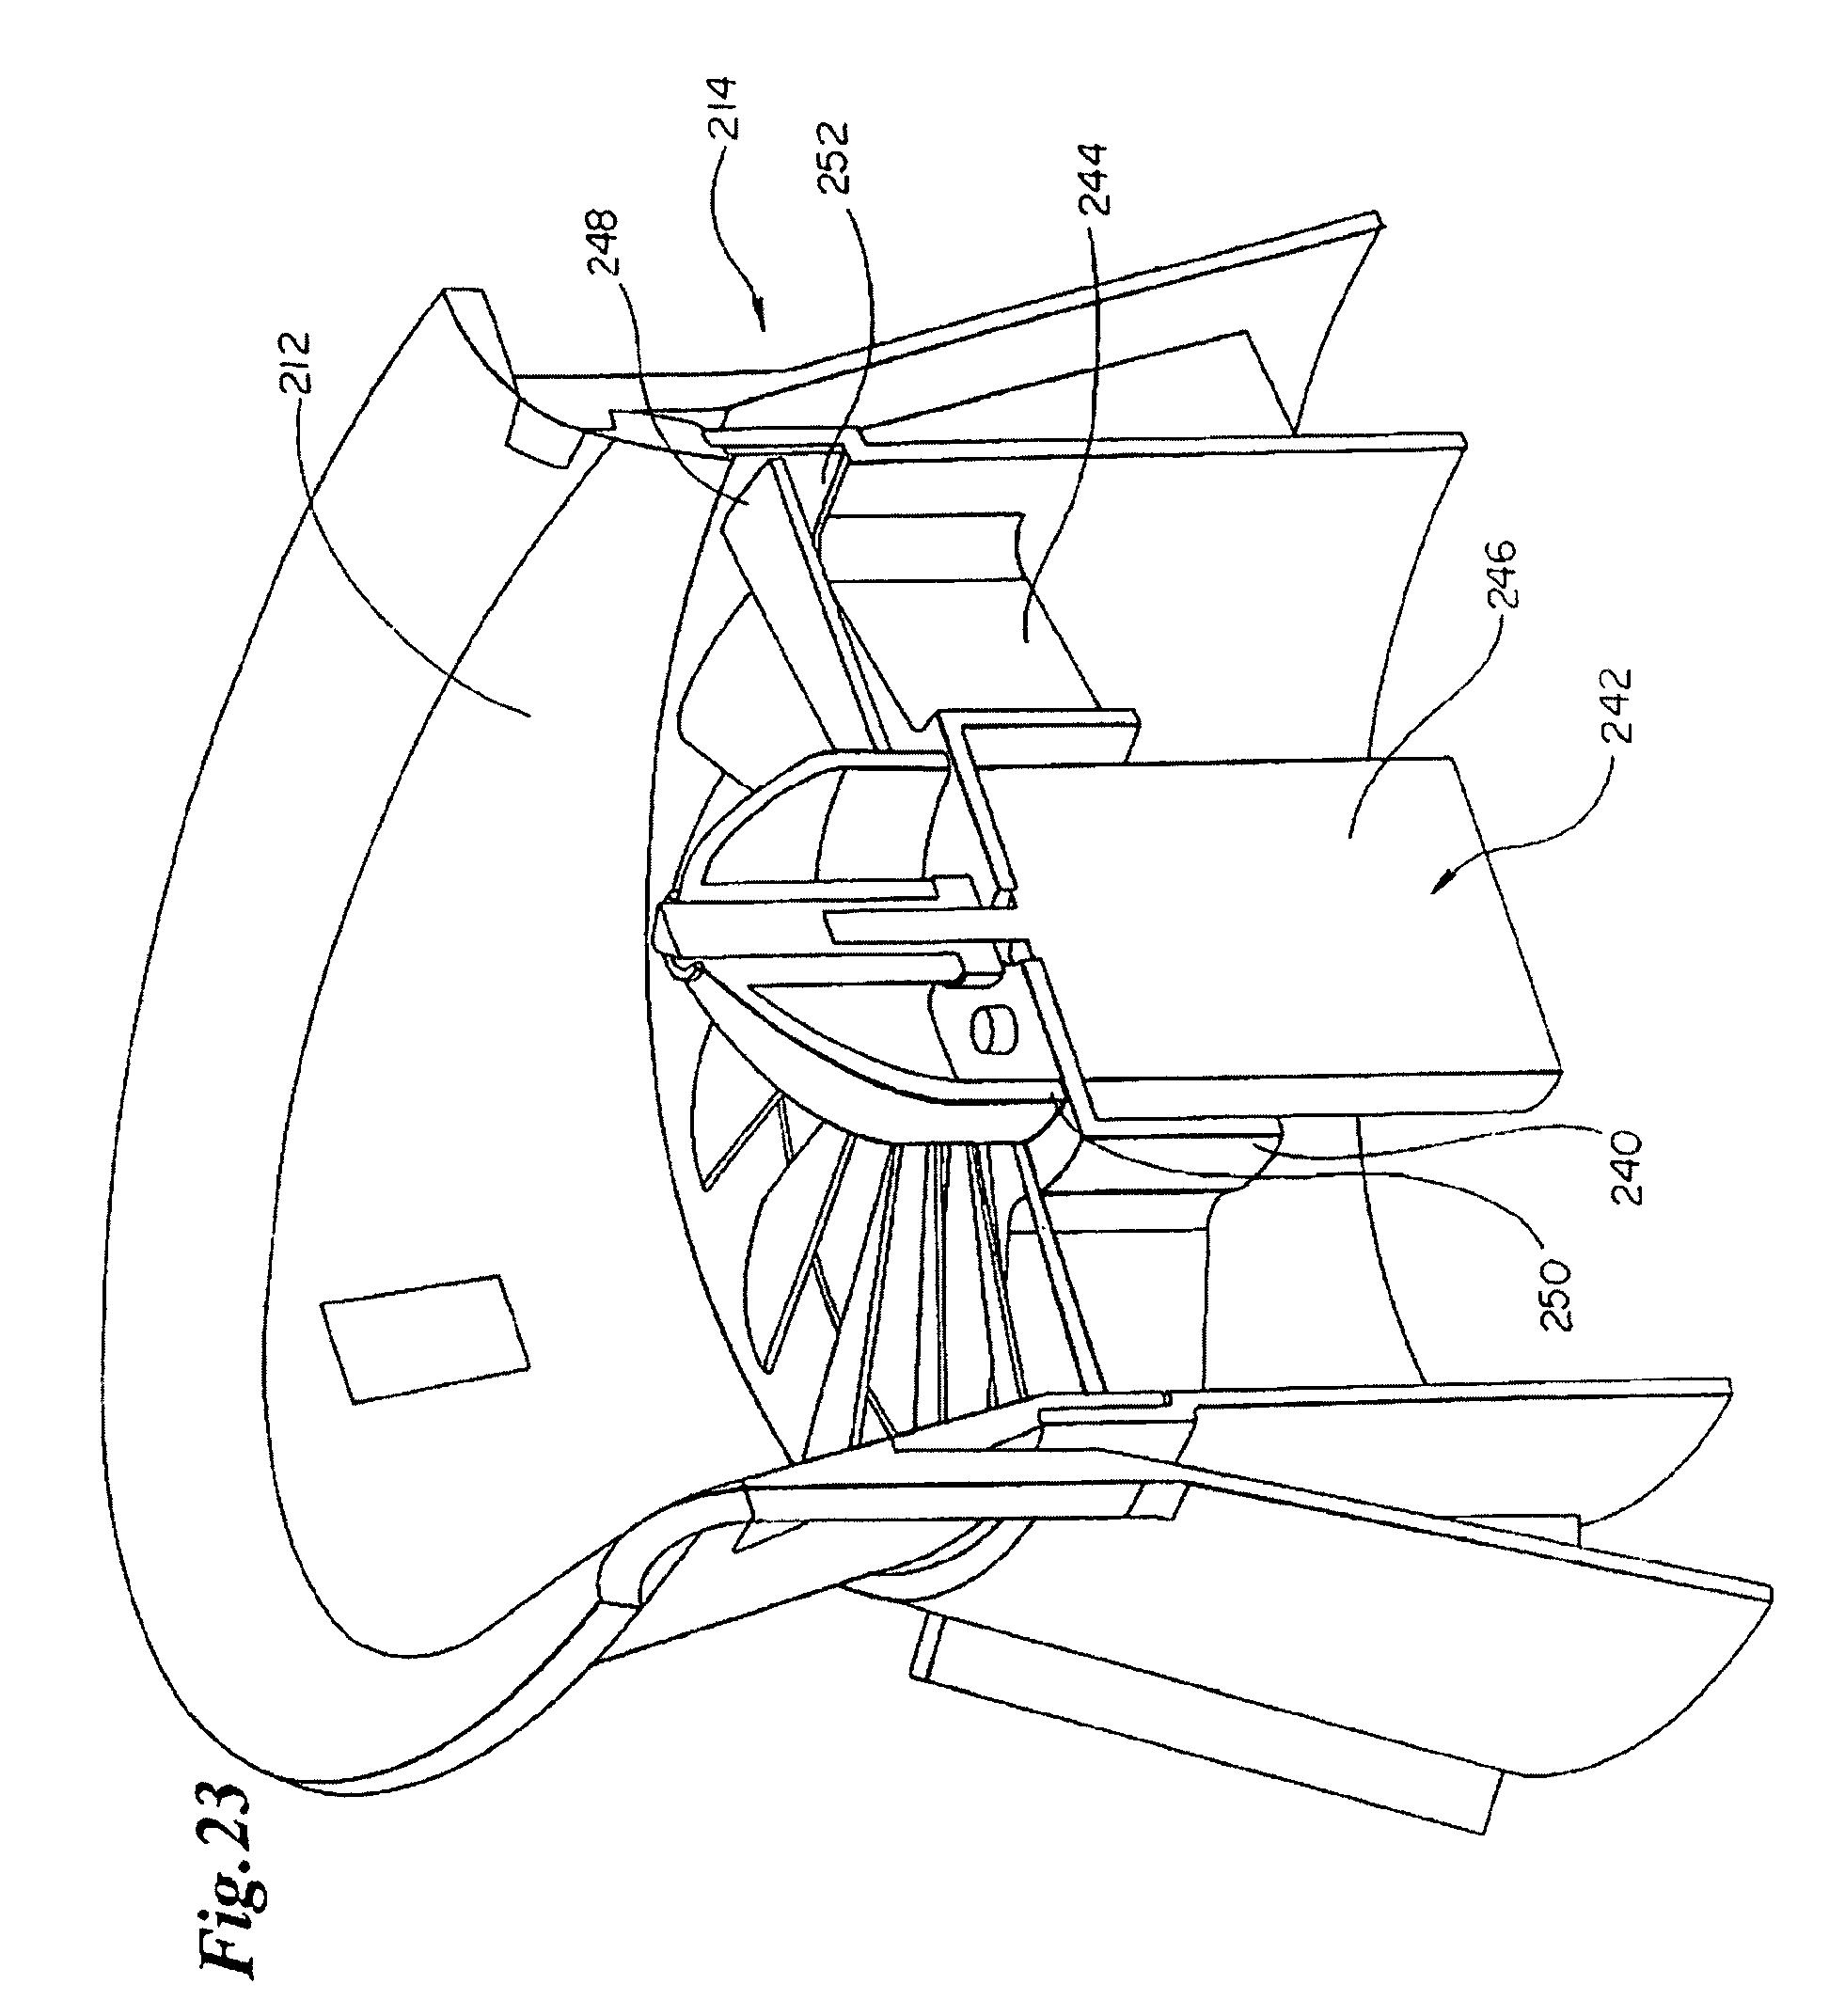 Patent Us7931239 - Homeostatic Flying Hovercraft